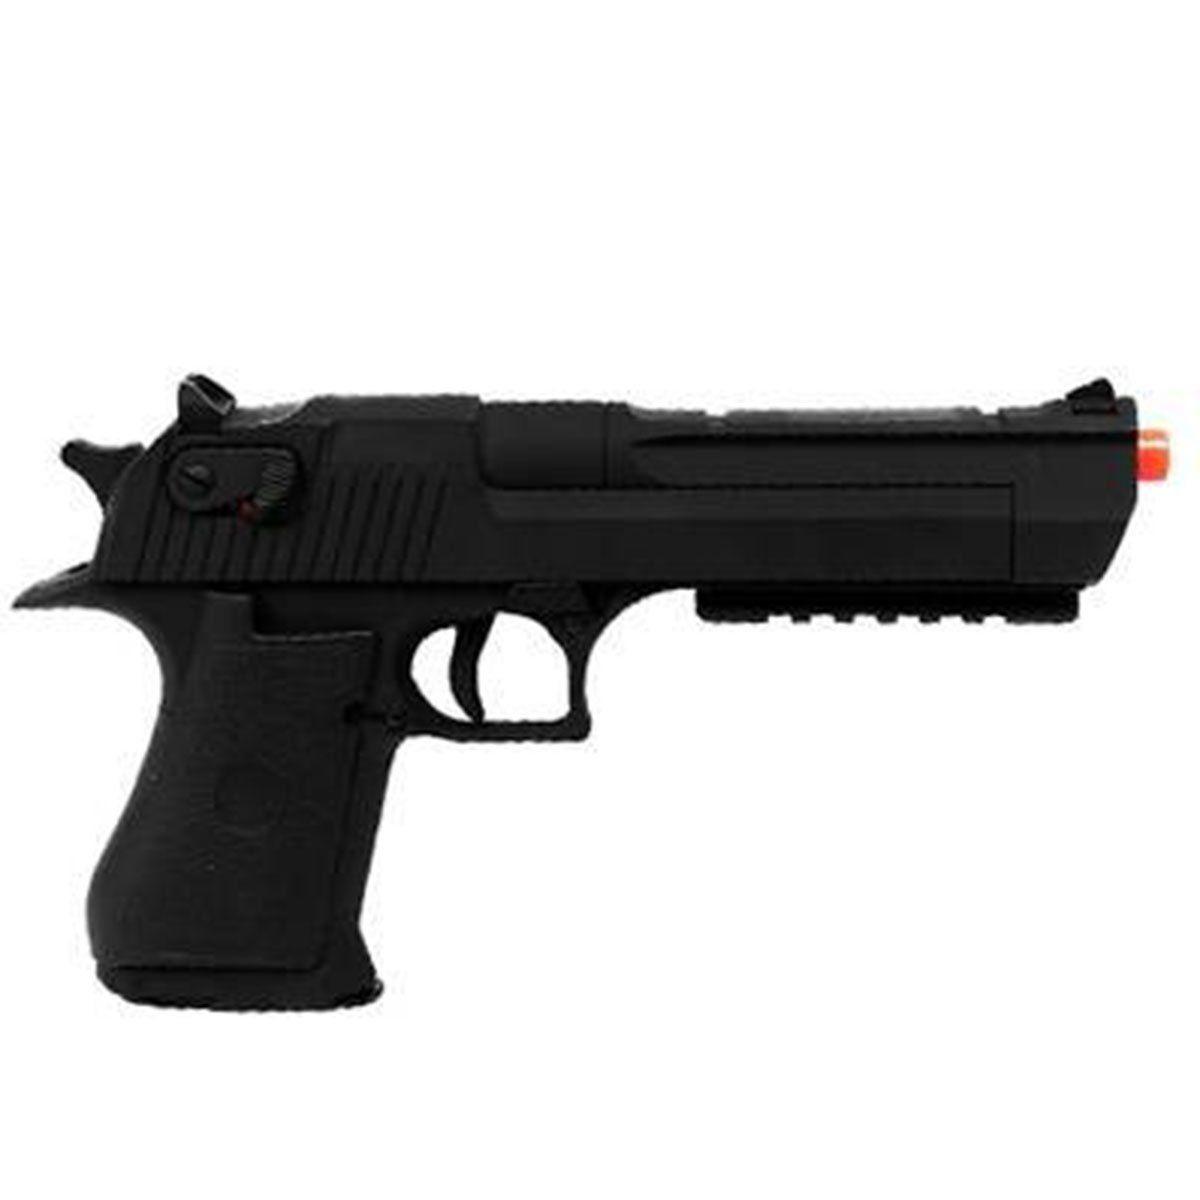 Pistola Airsoft Cyma Desert Eagler CM121 metal Elétrica bivolt 6 mm